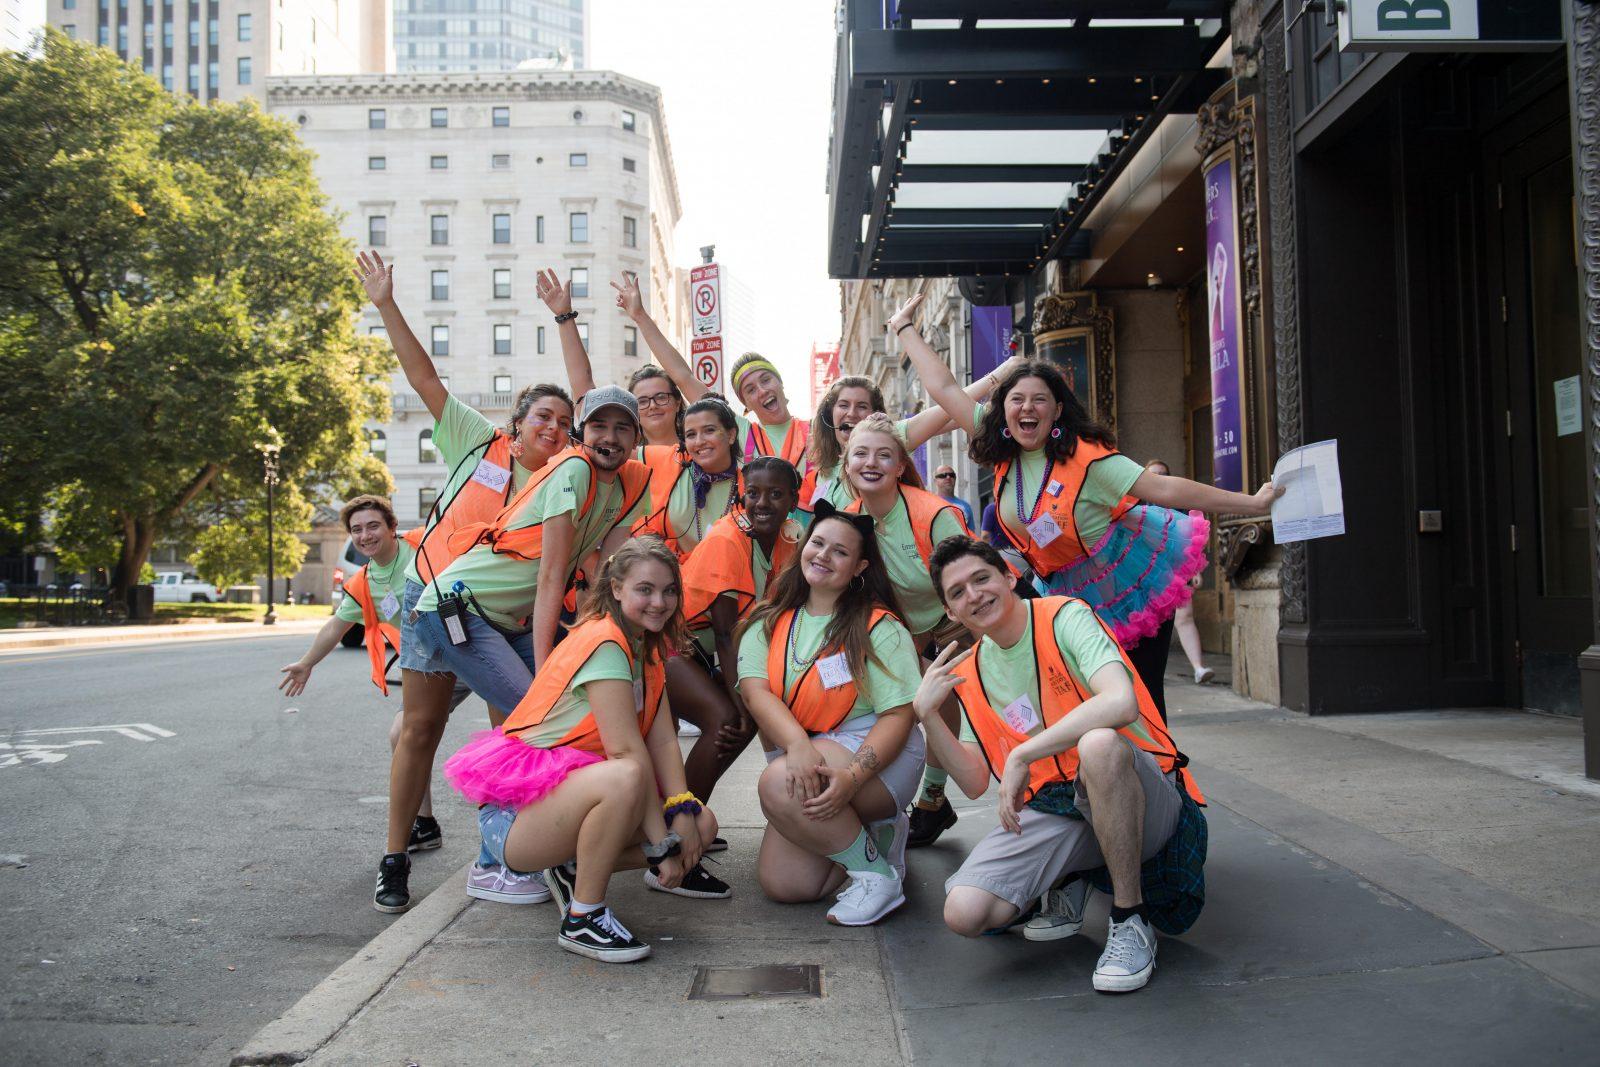 Student volunteers pose